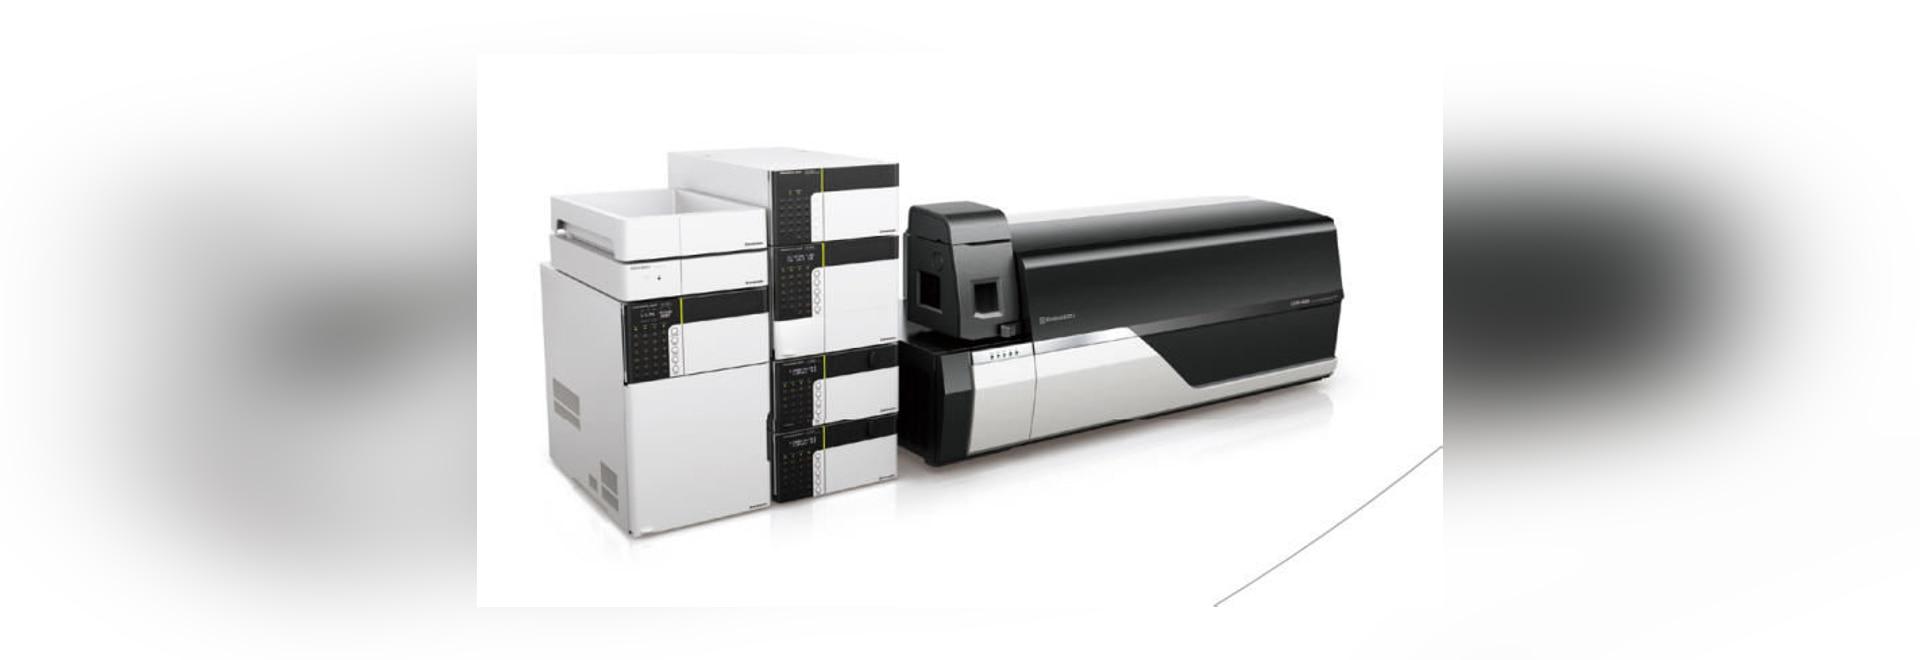 NEW LCMS-8060 Triple Quadrupole Liquid Chromatograph Mass Spectrometer